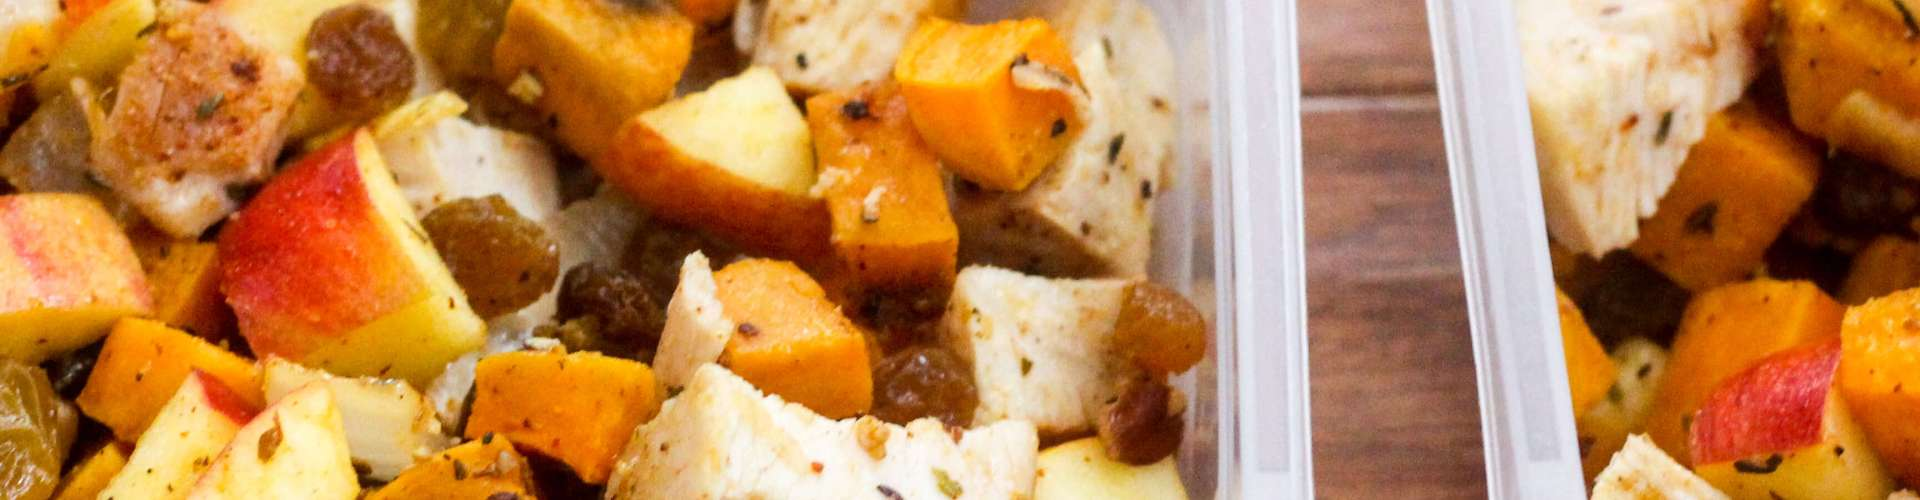 Paleo Meal Prep: Chicken, Sweet Potato, and Apple Salad